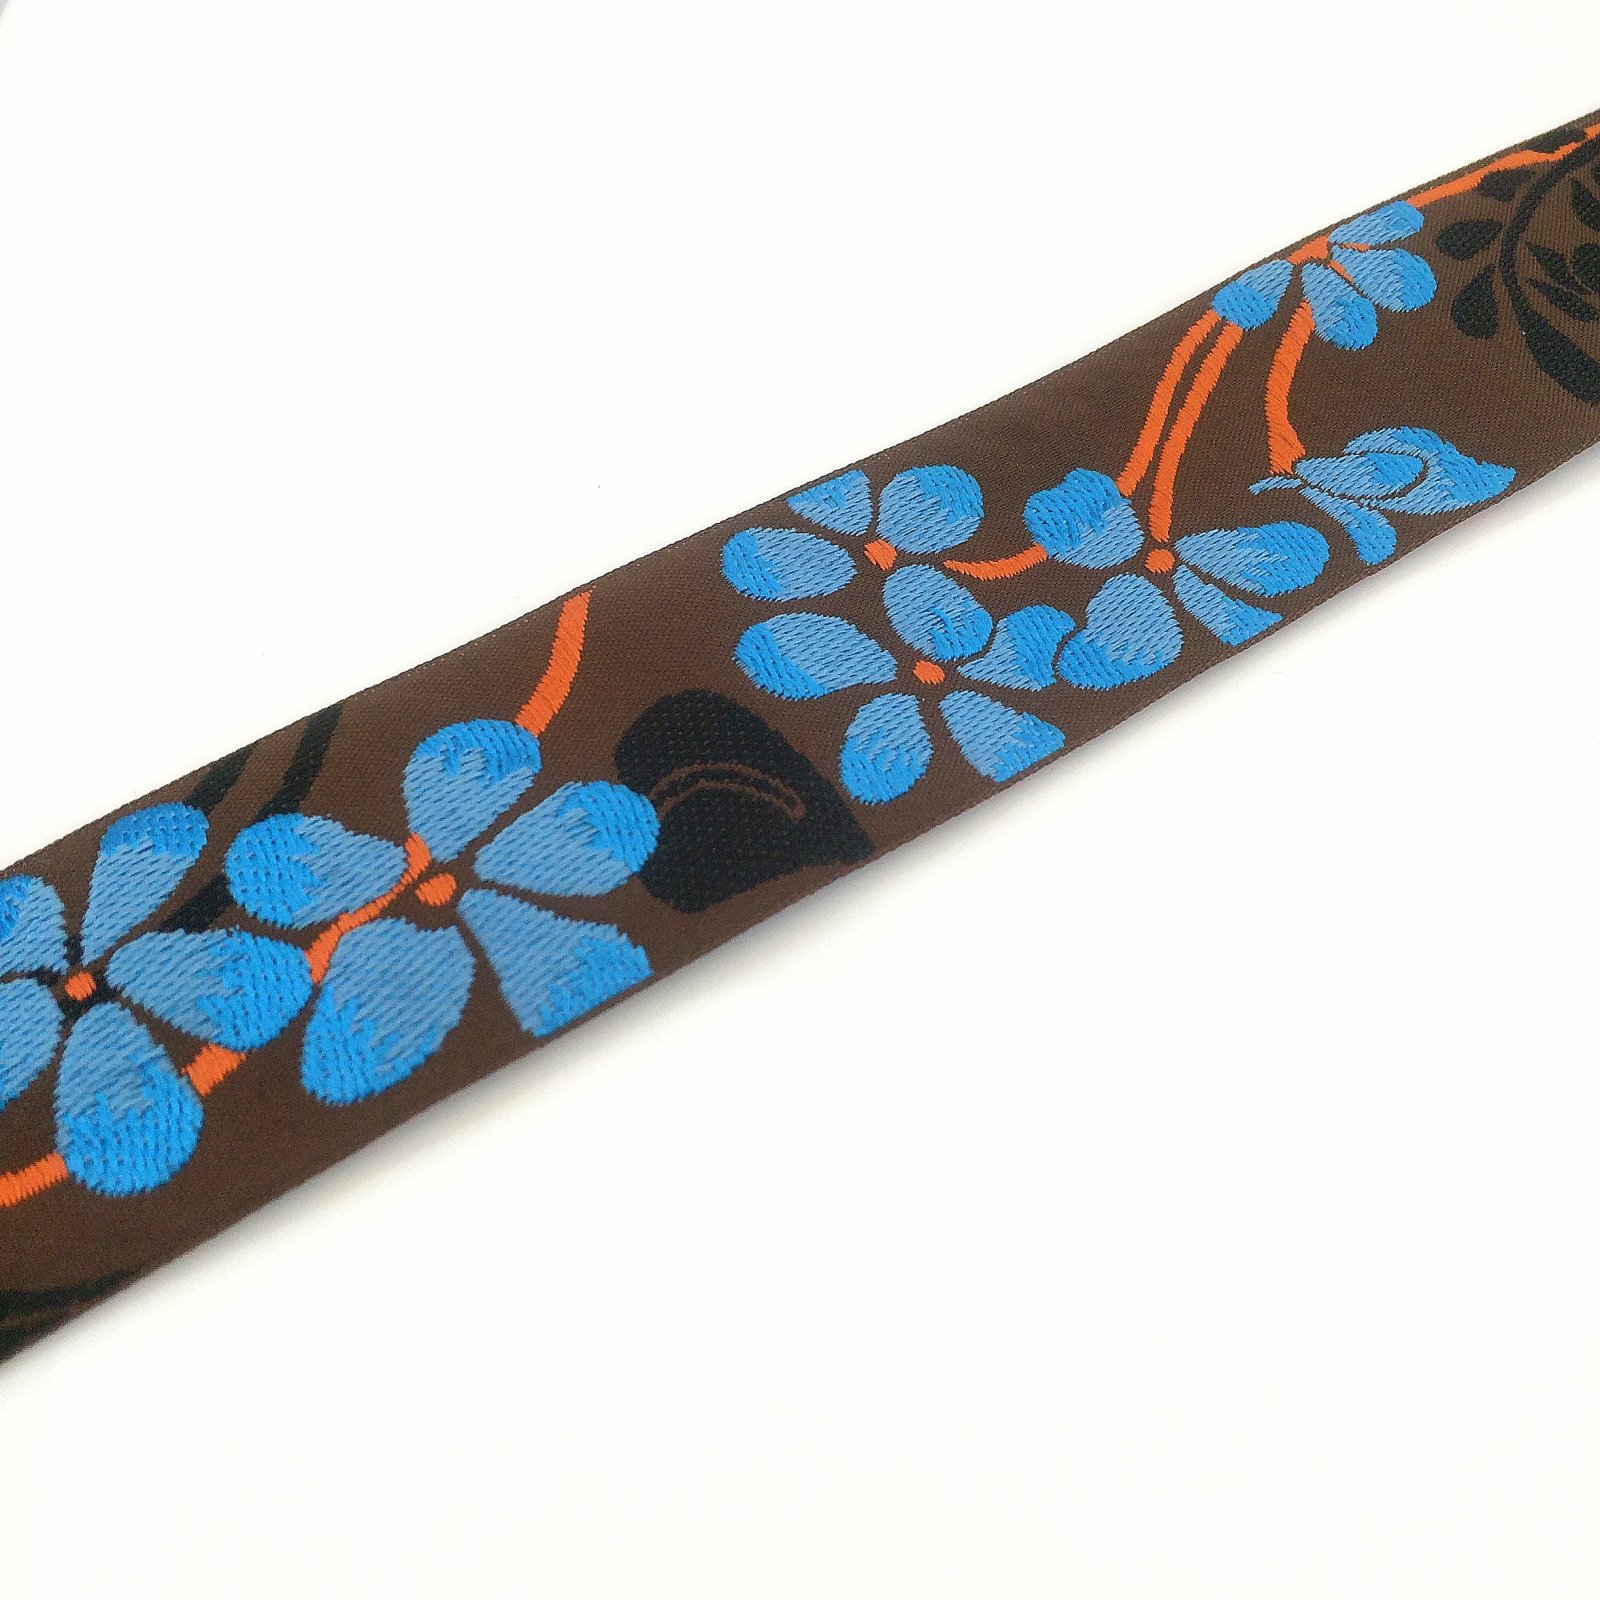 RENAISSANCE RIBBONS - FLOWER - BLUE ON BROWN